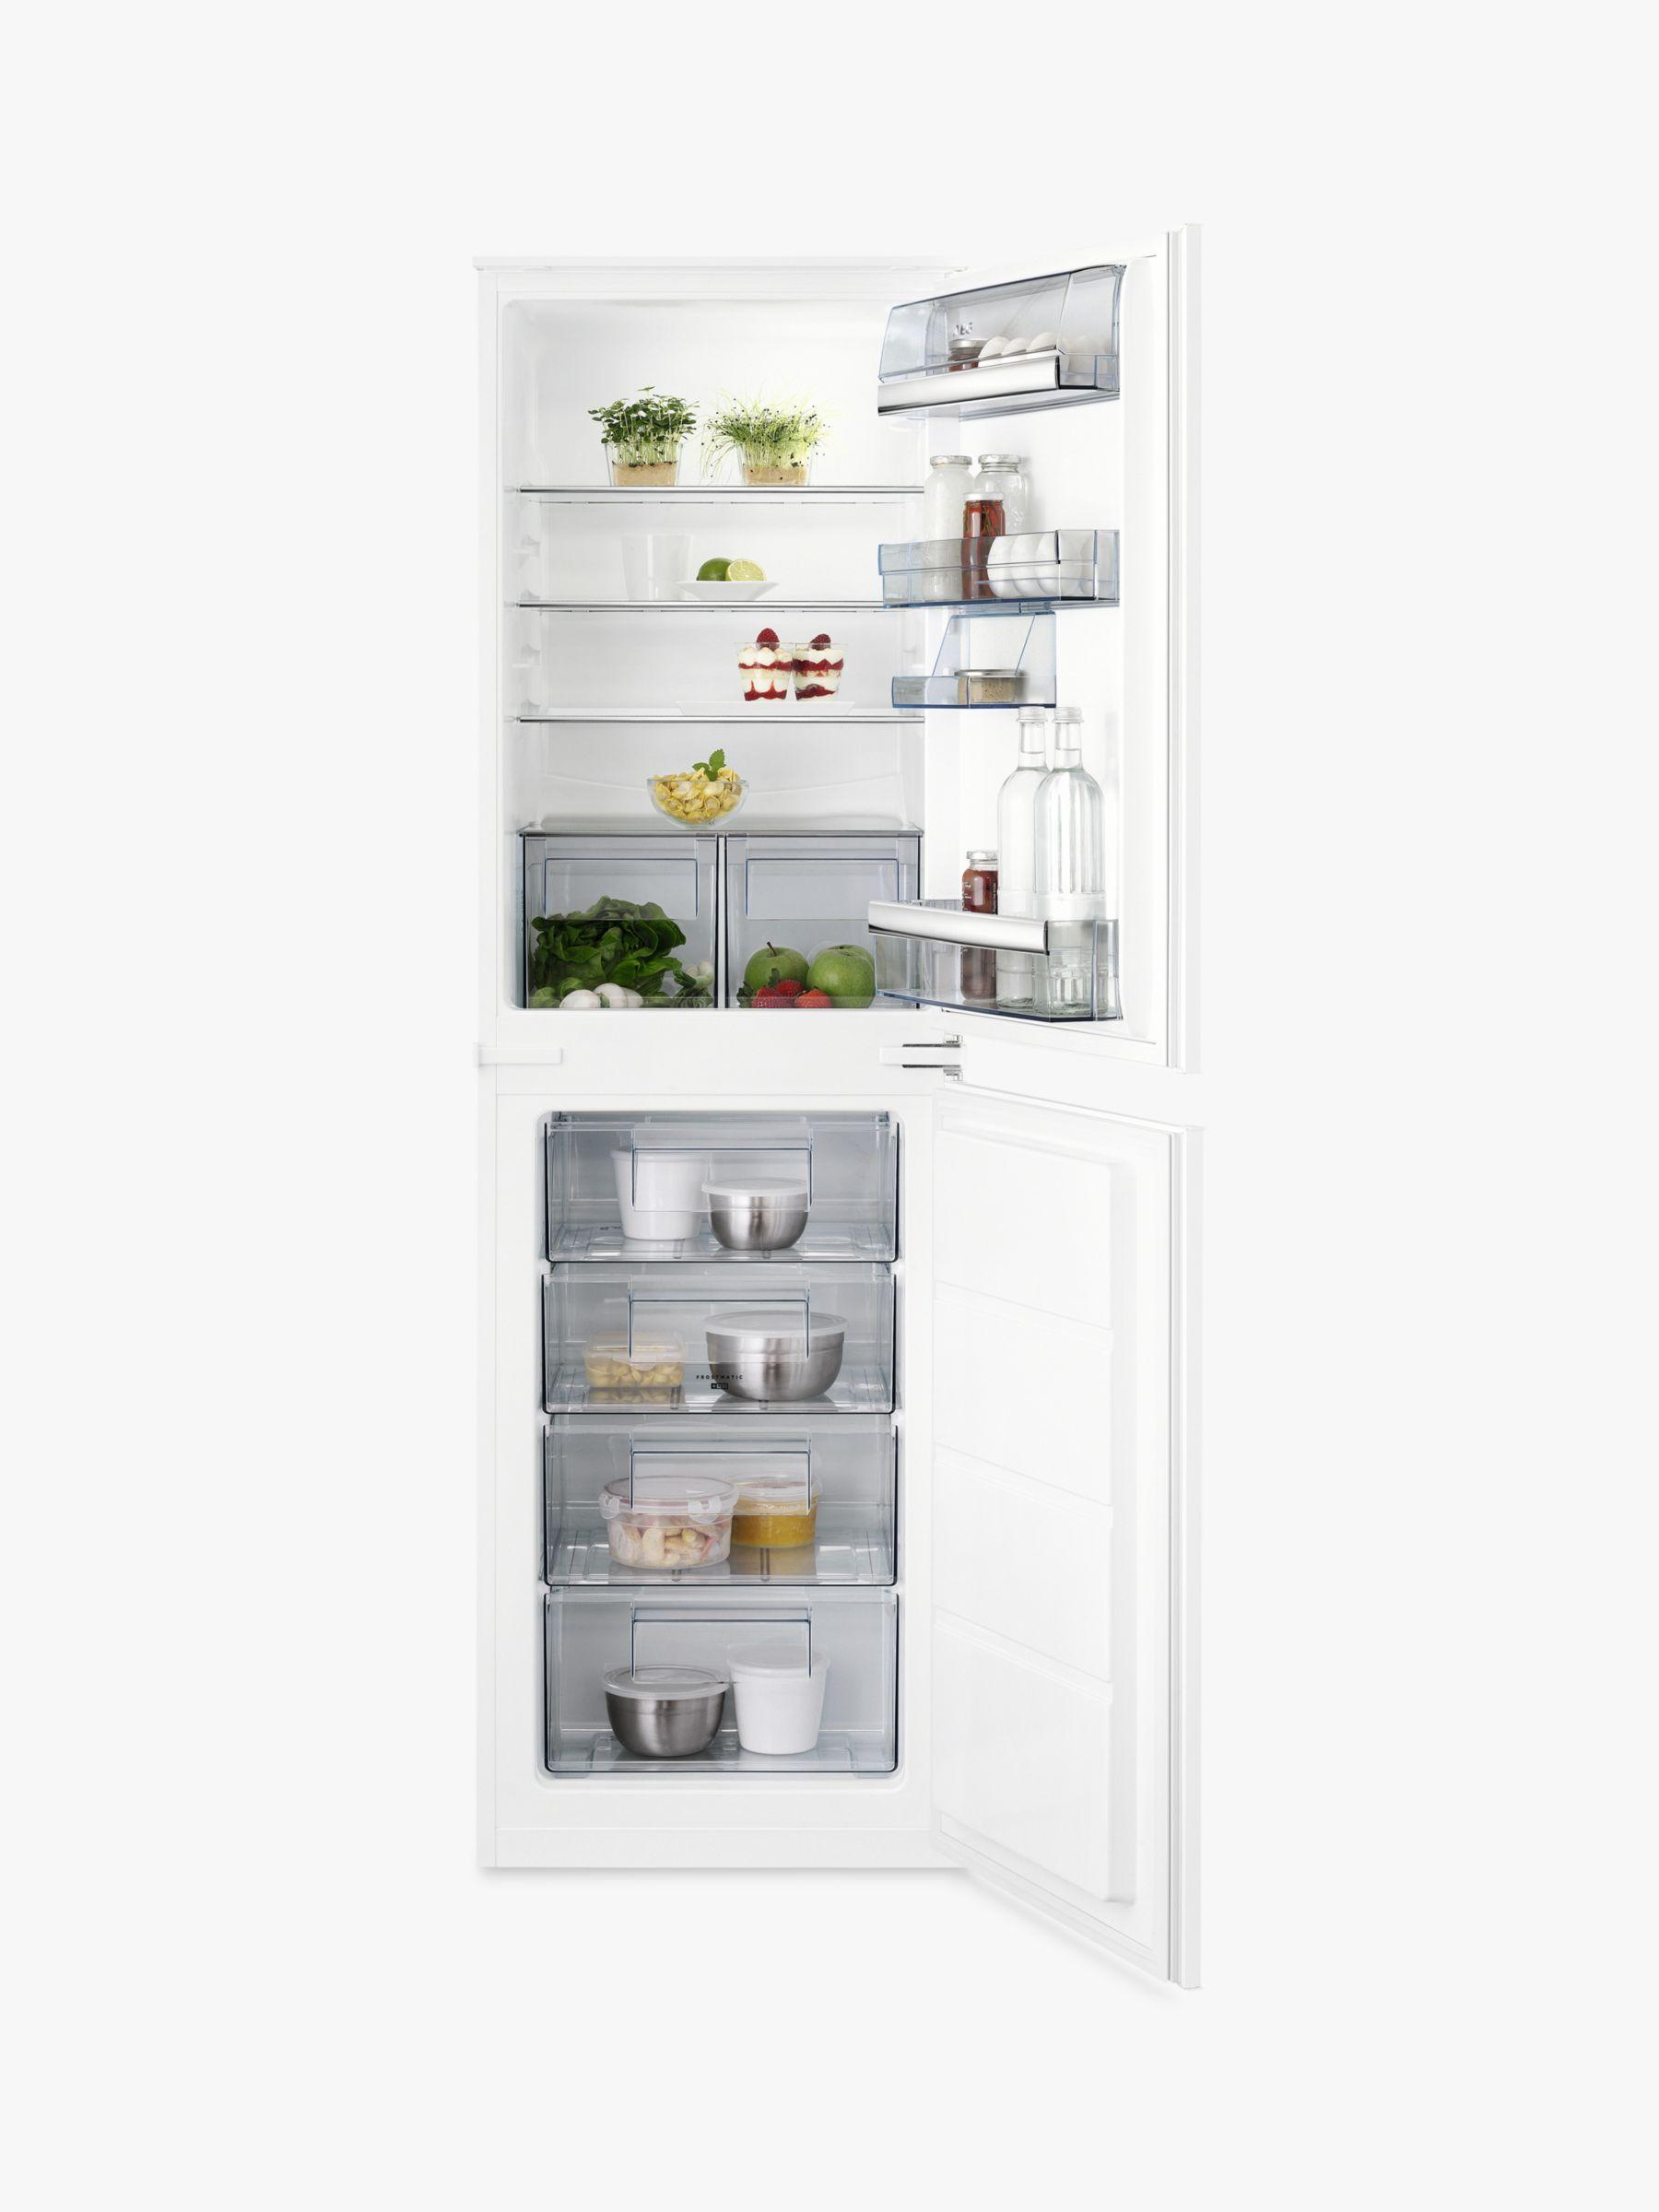 AEG AEG SCB6181VLS Integrated Fridge Freezer, A+ Energy Rating, 55cm Wide, White